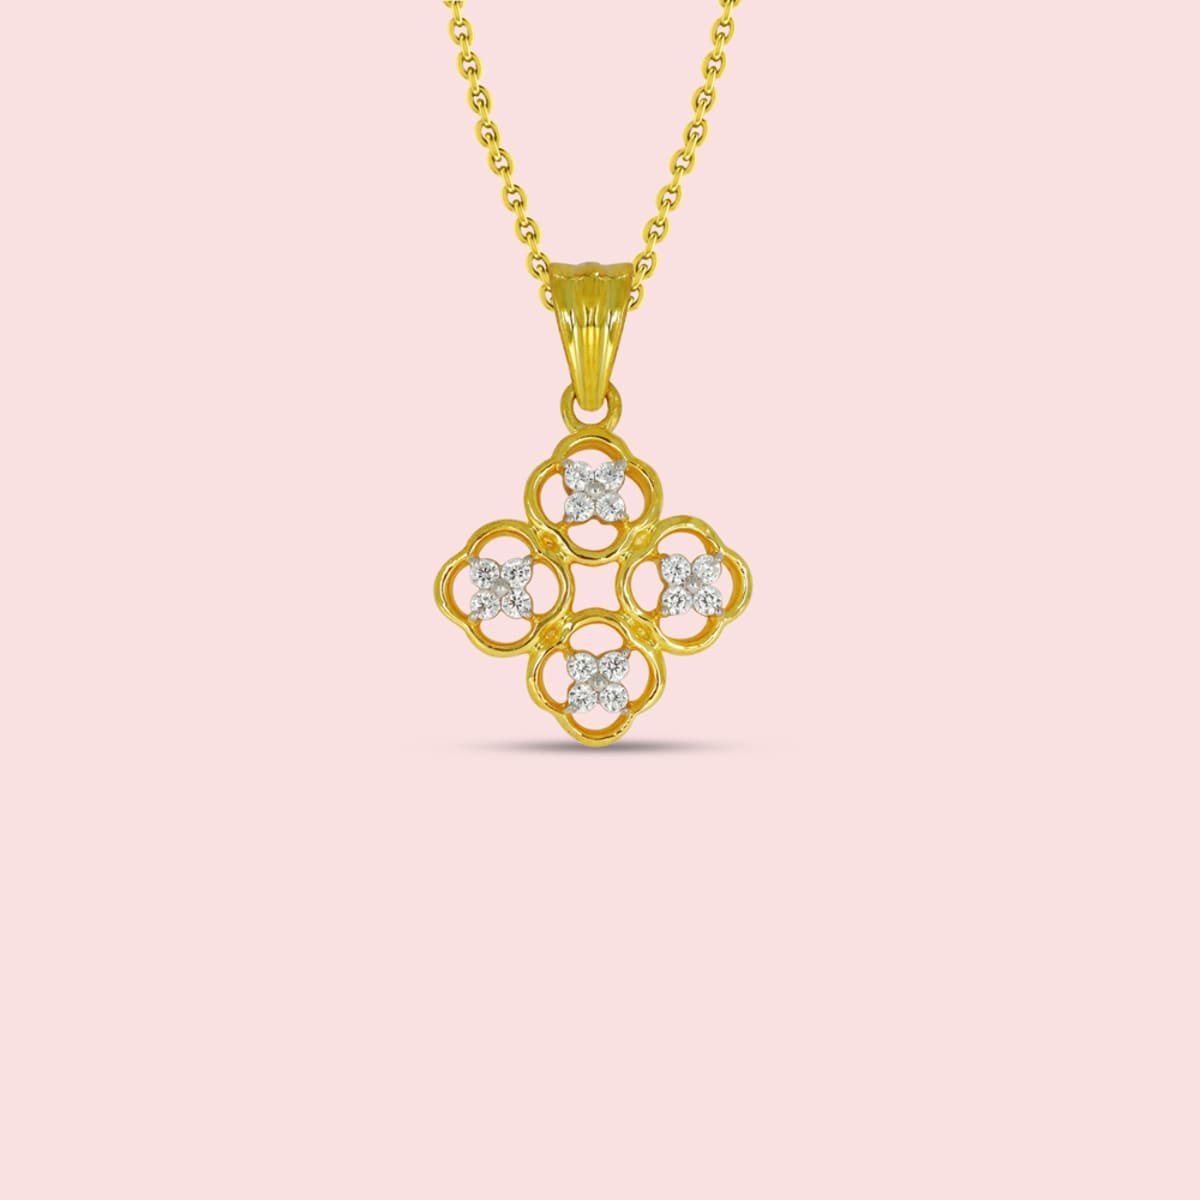 Yellow Gold Real Diamond Pendant